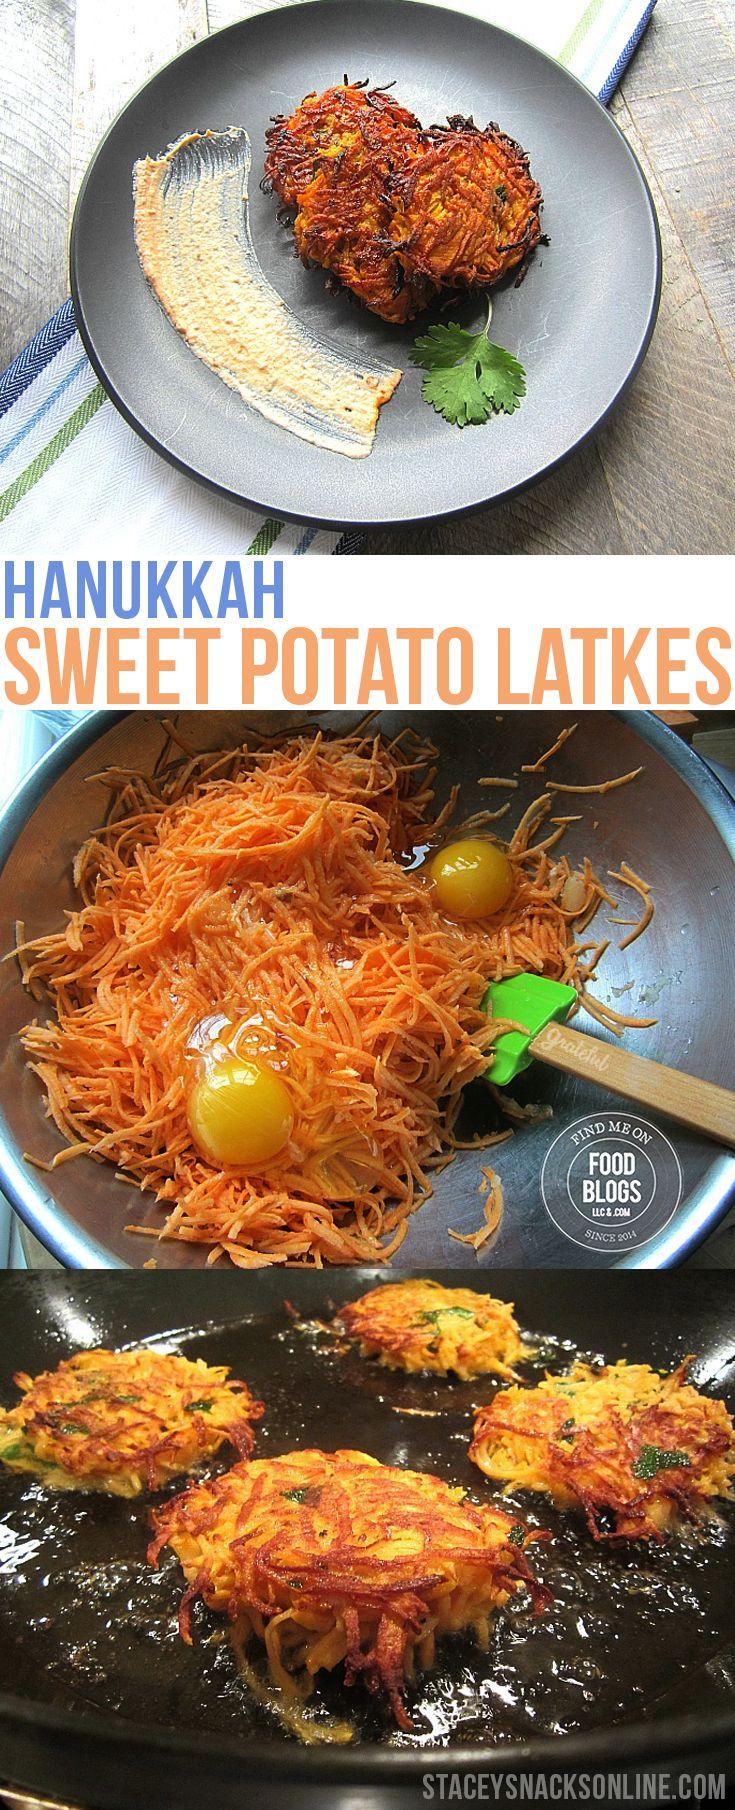 Hanukkah Sweet Potato Latkes Recipe @FoodBlogs.com Celebrate Hanukkah the right way!